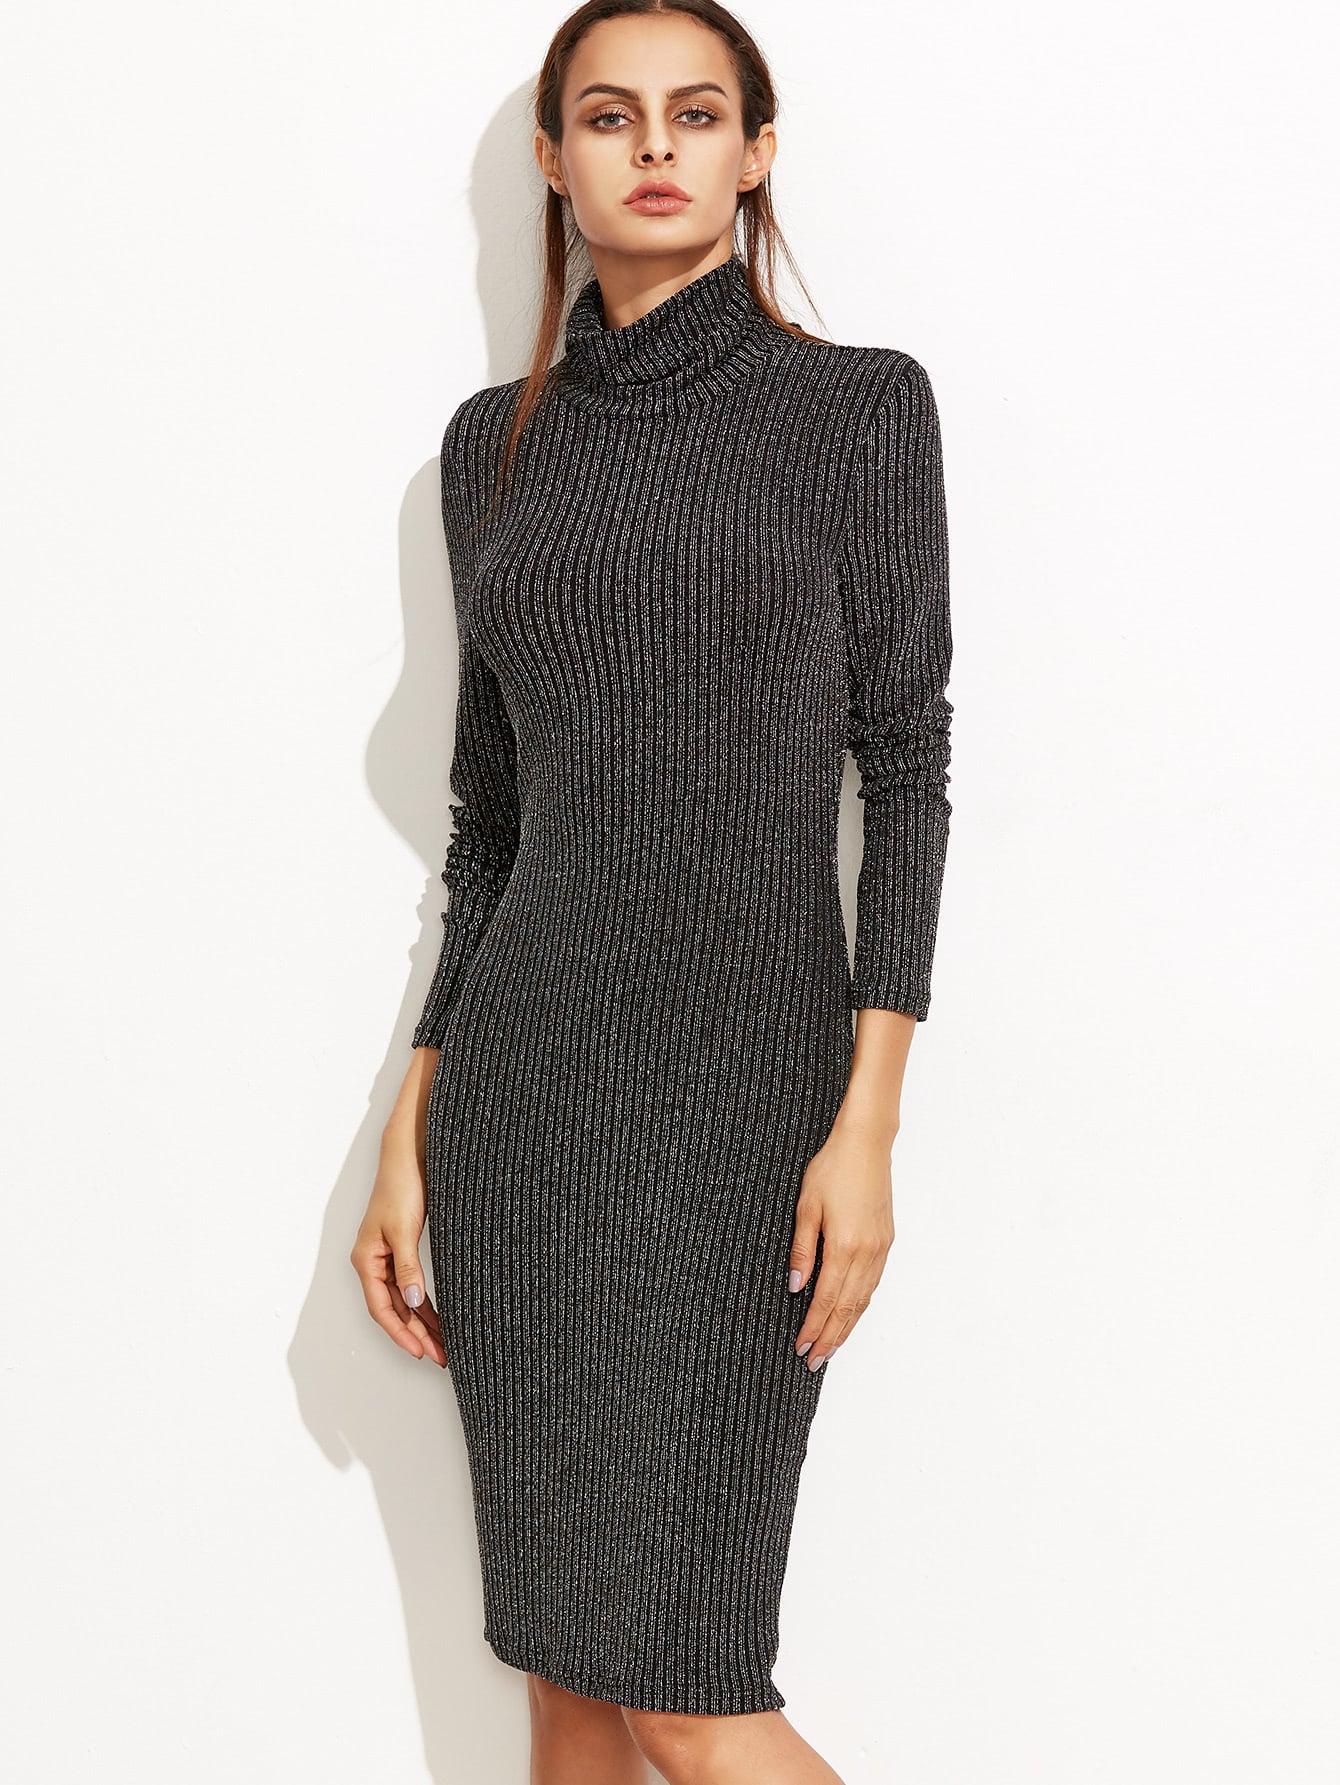 Black Marled Knit Cowl Neck Ribbed Pencil Dress dress161005706